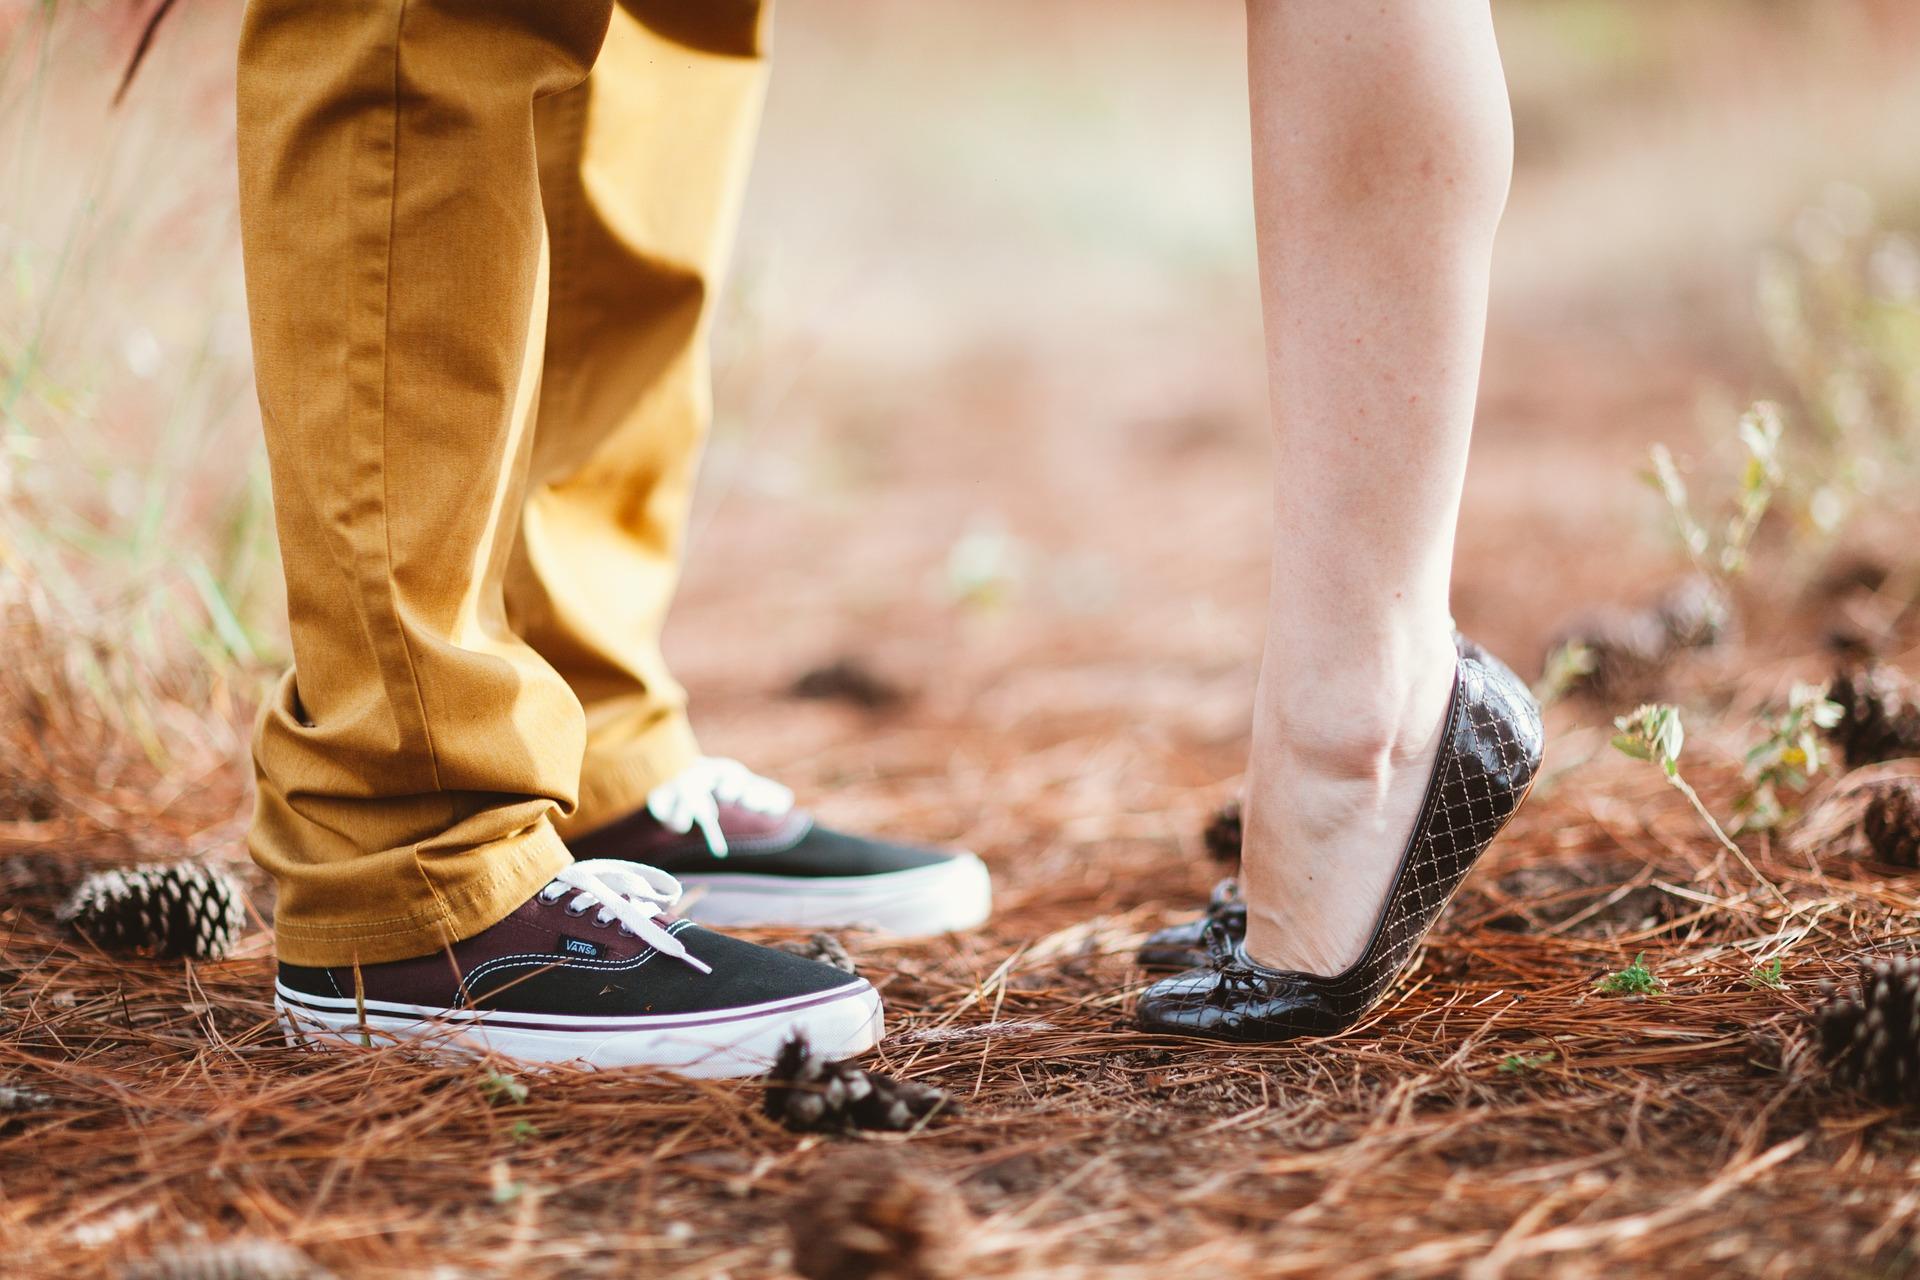 Divorcio en Houston Alternativas para Redefinir el Matrimonio